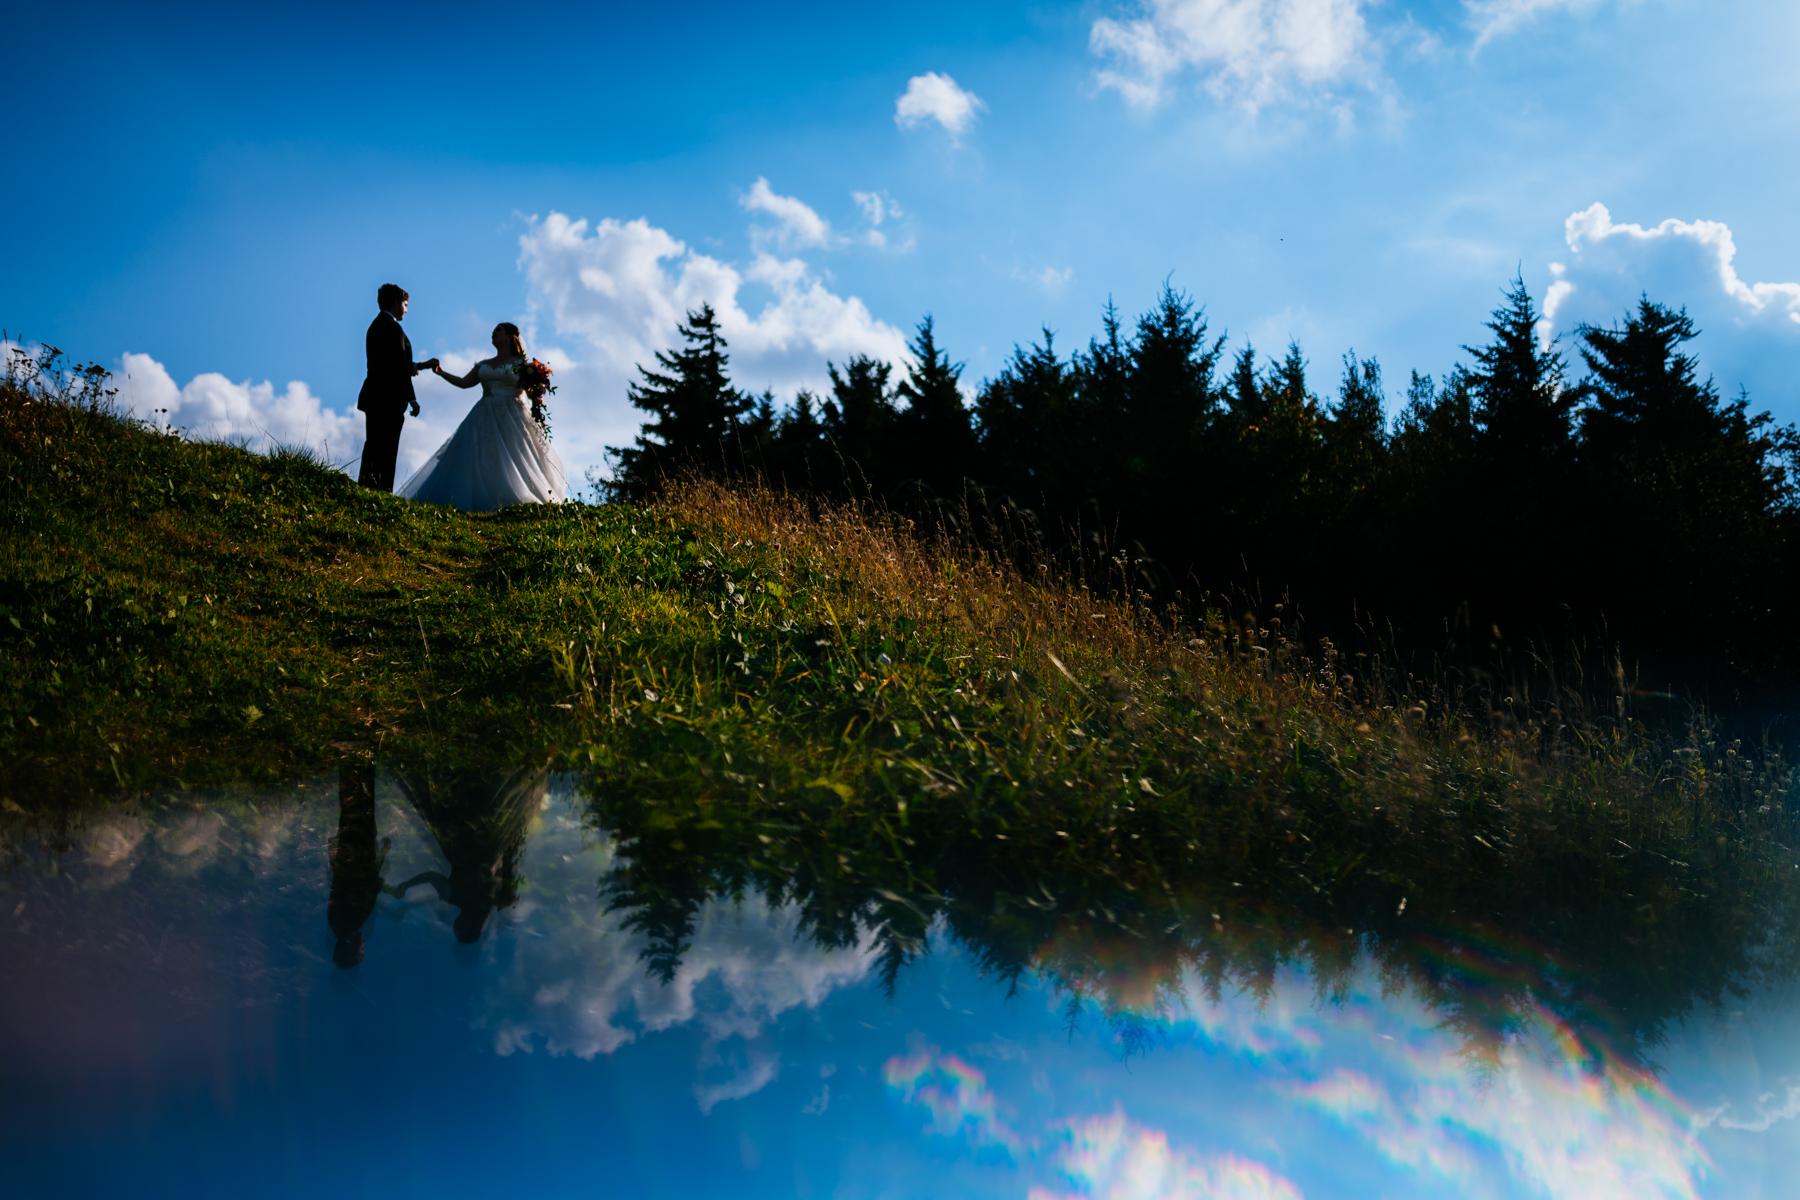 silhouette reflection creative wedding portrait